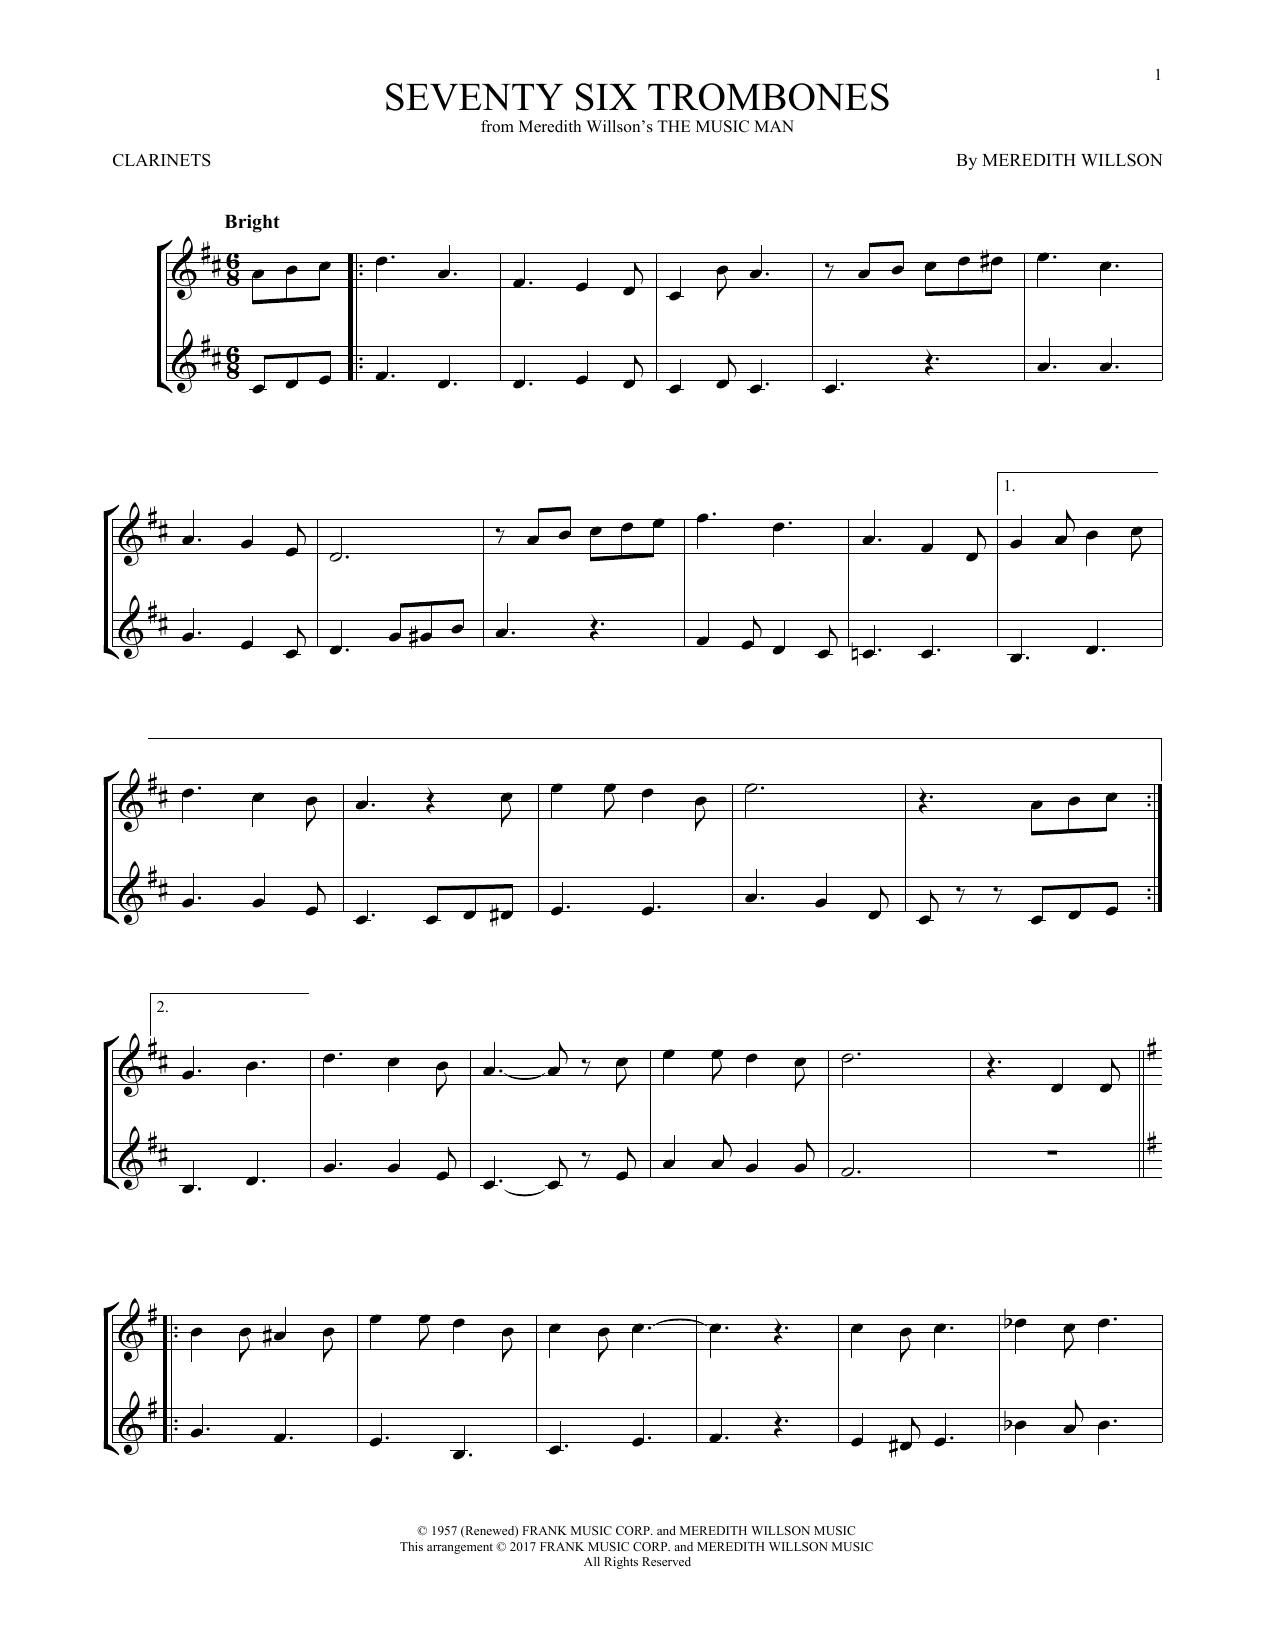 Seventy Six Trombones (Clarinet Duet)